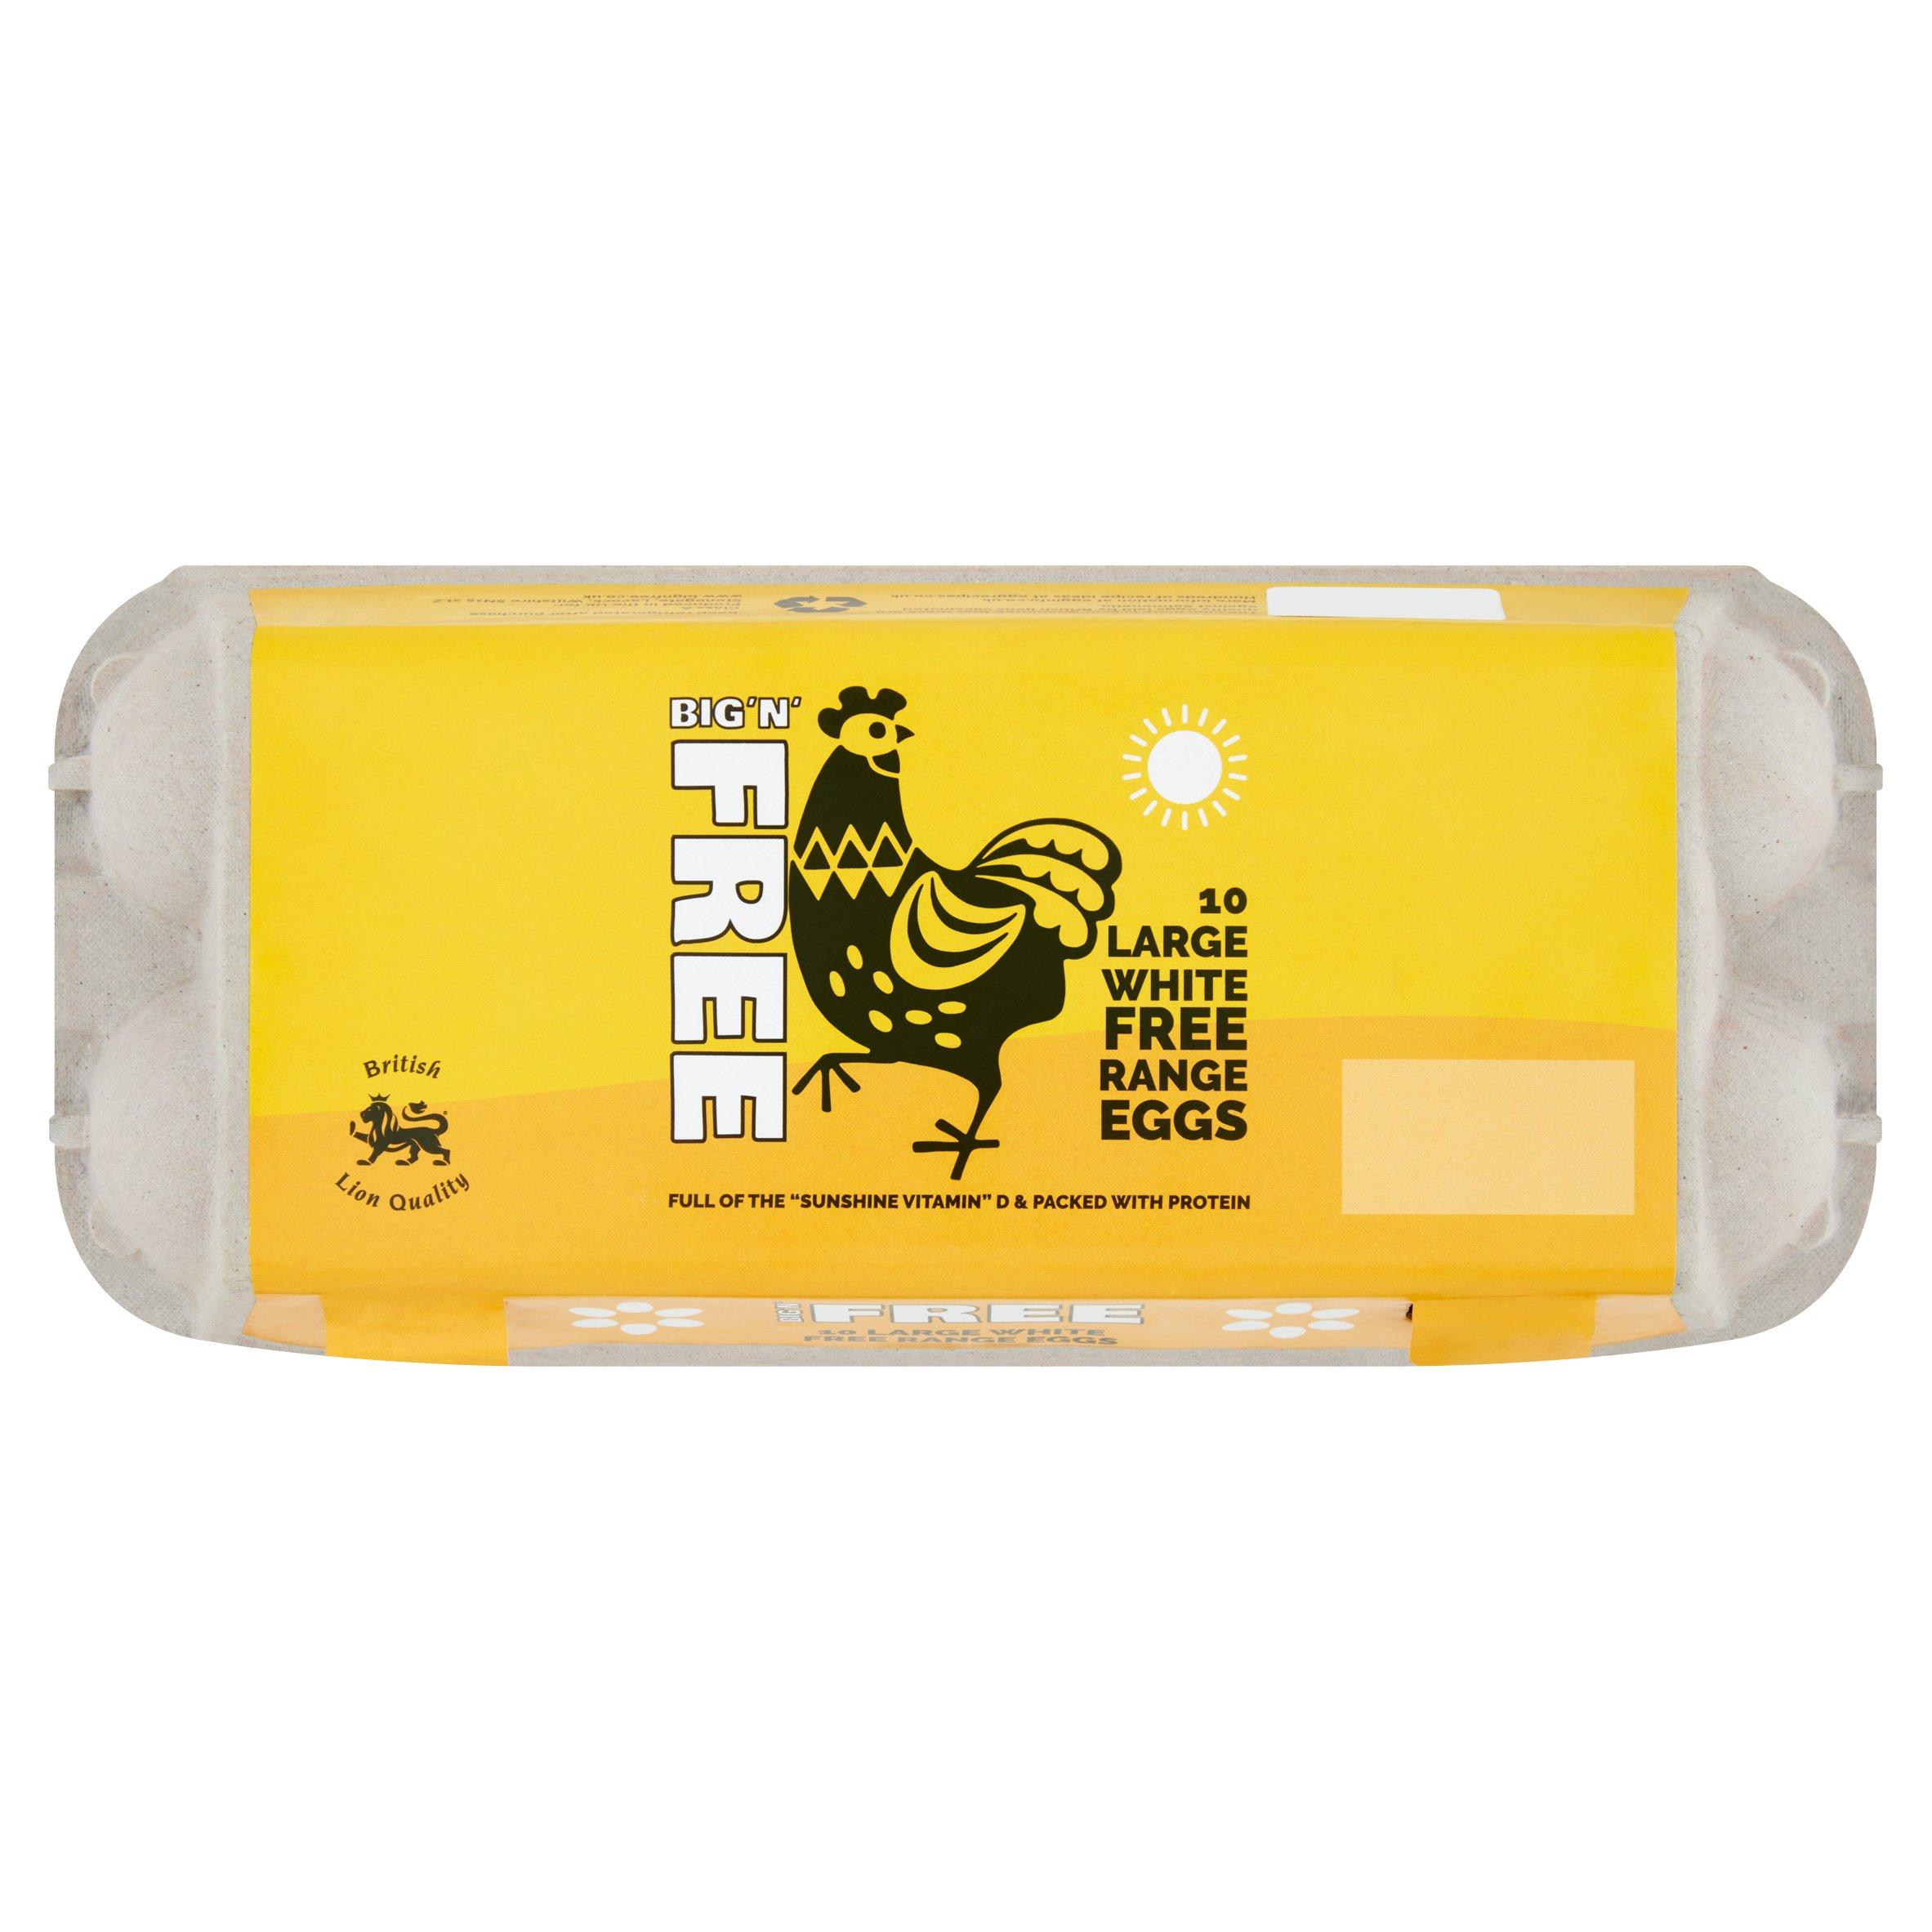 Big & Free Large White Free Range Eggs 10 Pack